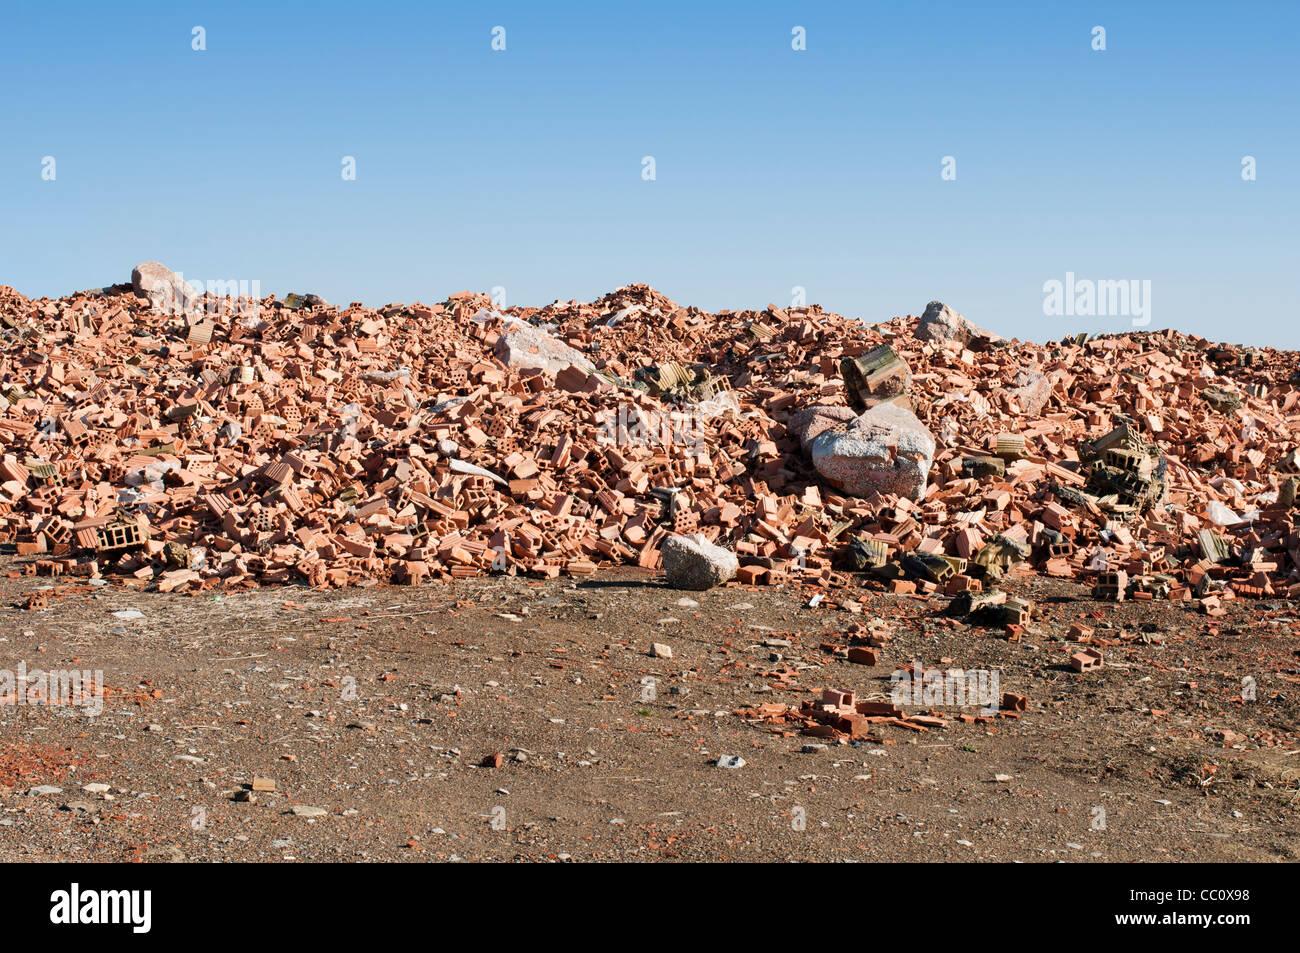 Landfill for disposal of construction waste. Brick debris - Stock Image